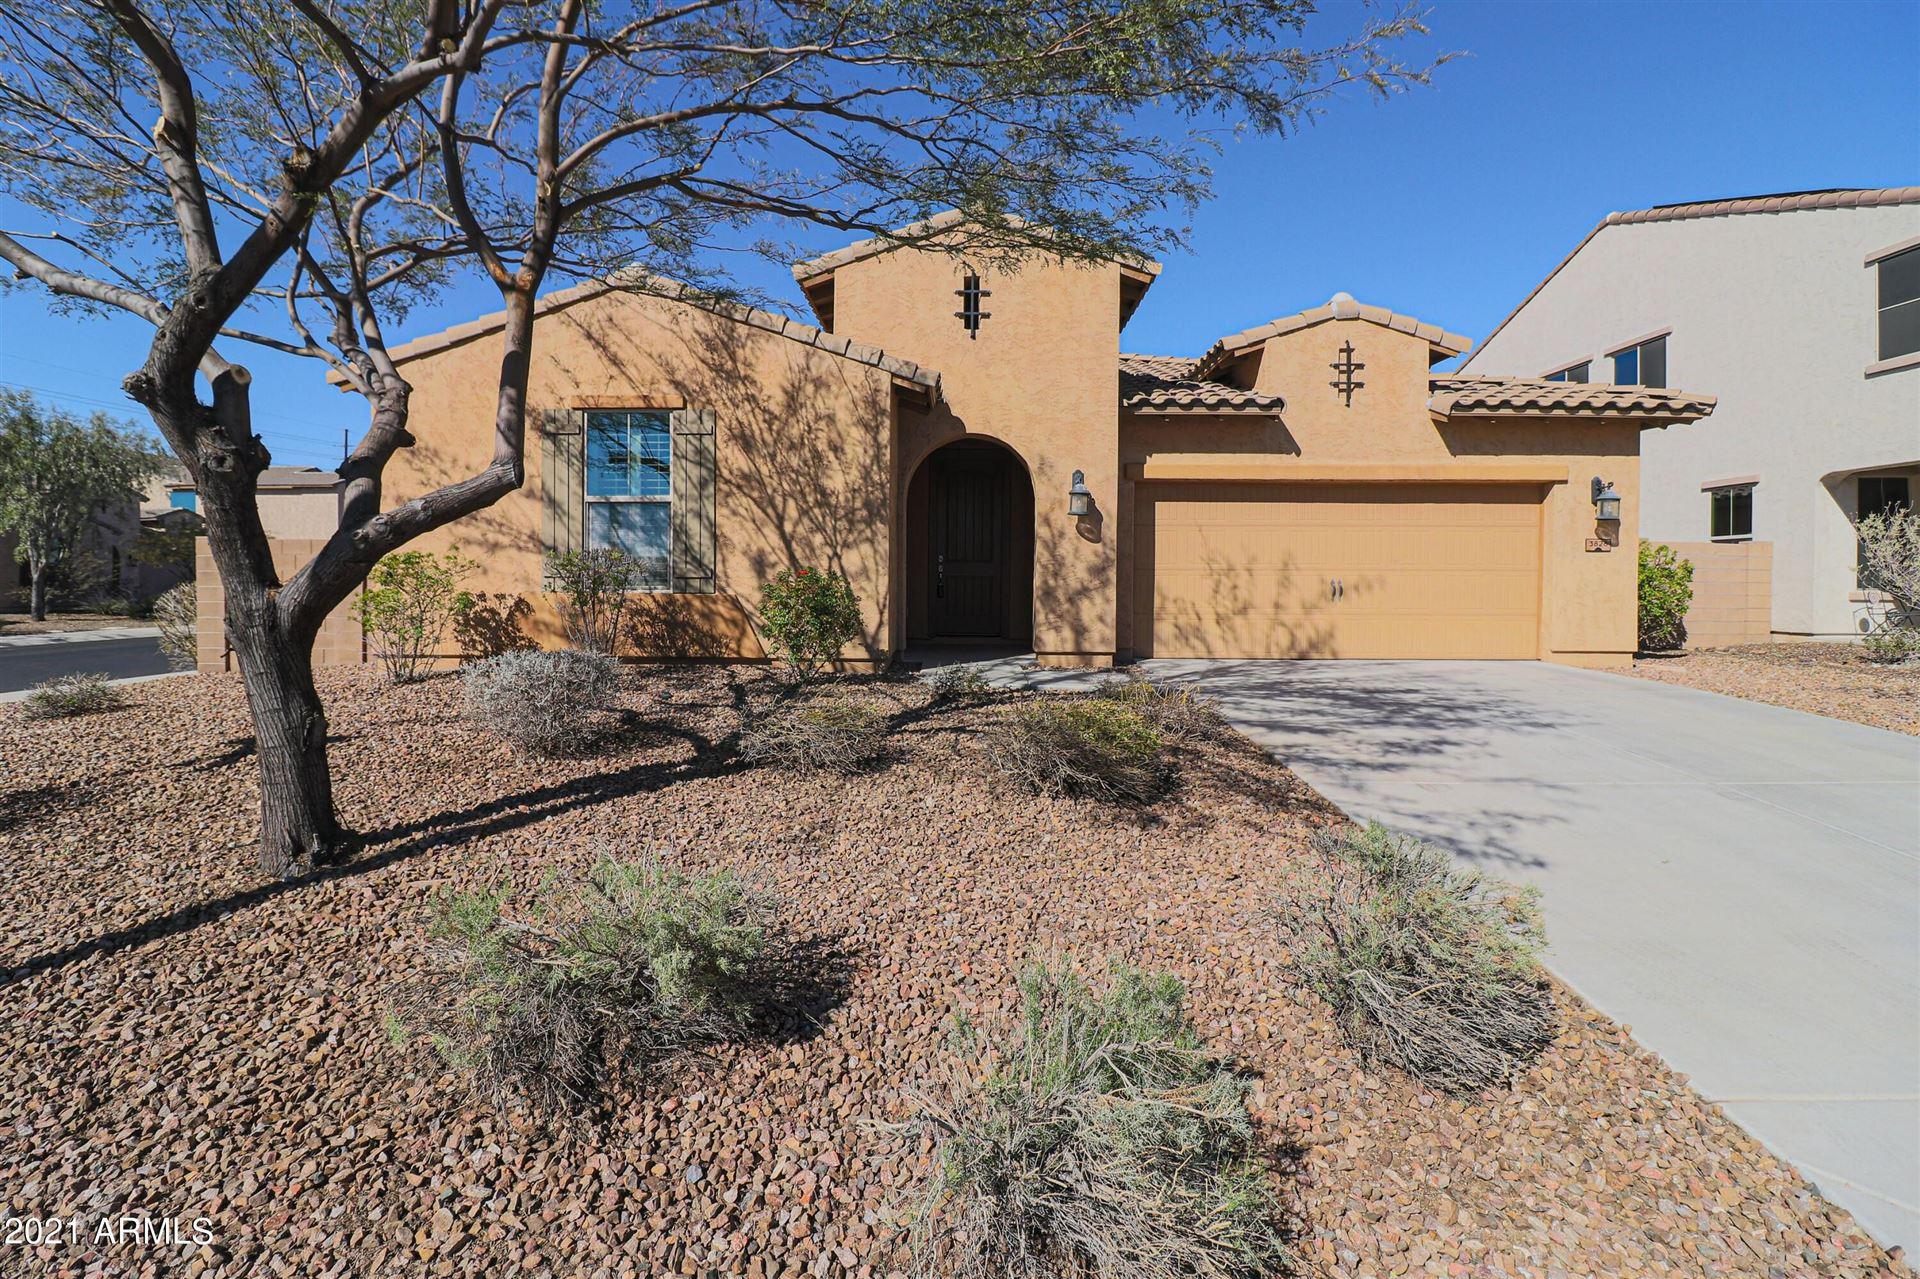 Photo of 3826 W ARACELY Drive, New River, AZ 85087 (MLS # 6196093)